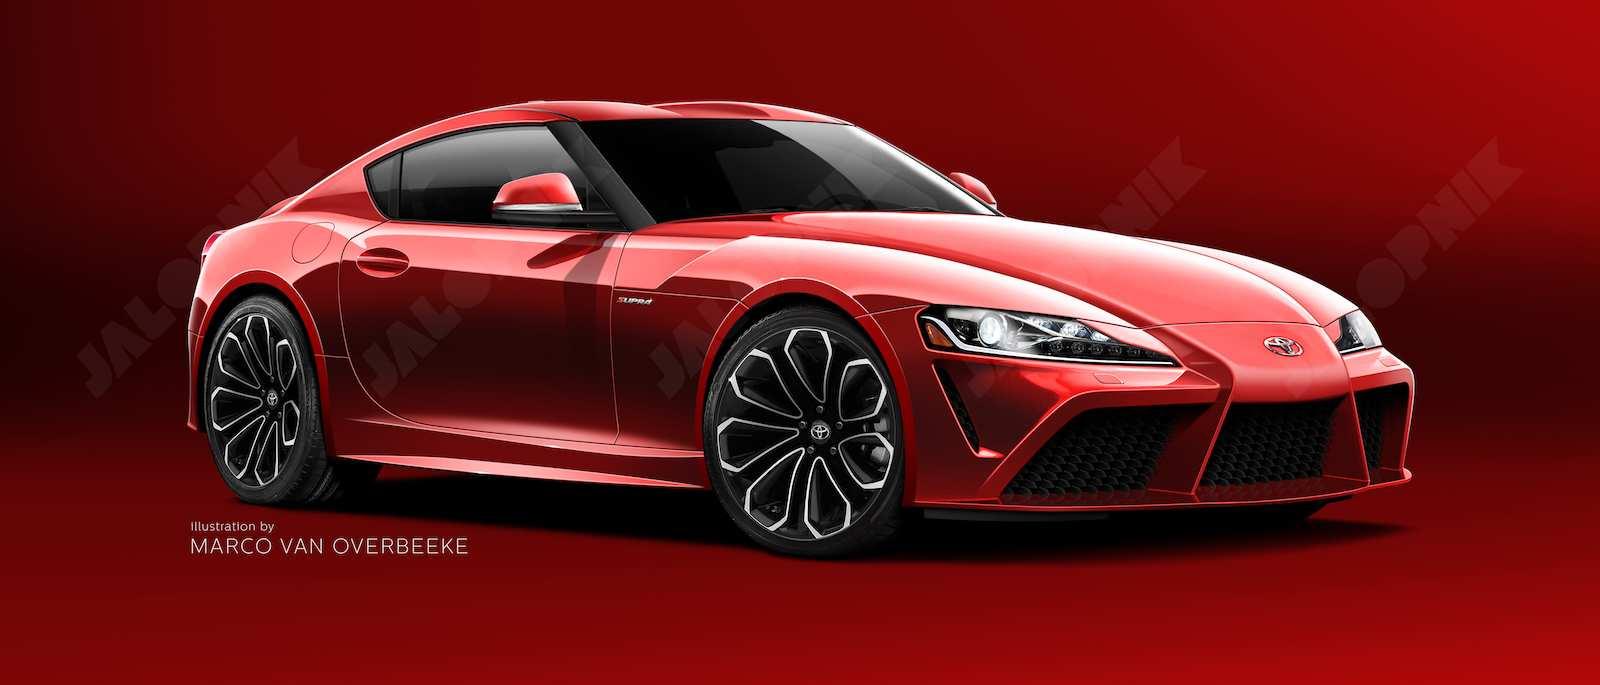 45 Concept of 2020 Toyota Supra Jalopnik New Concept with 2020 Toyota Supra Jalopnik